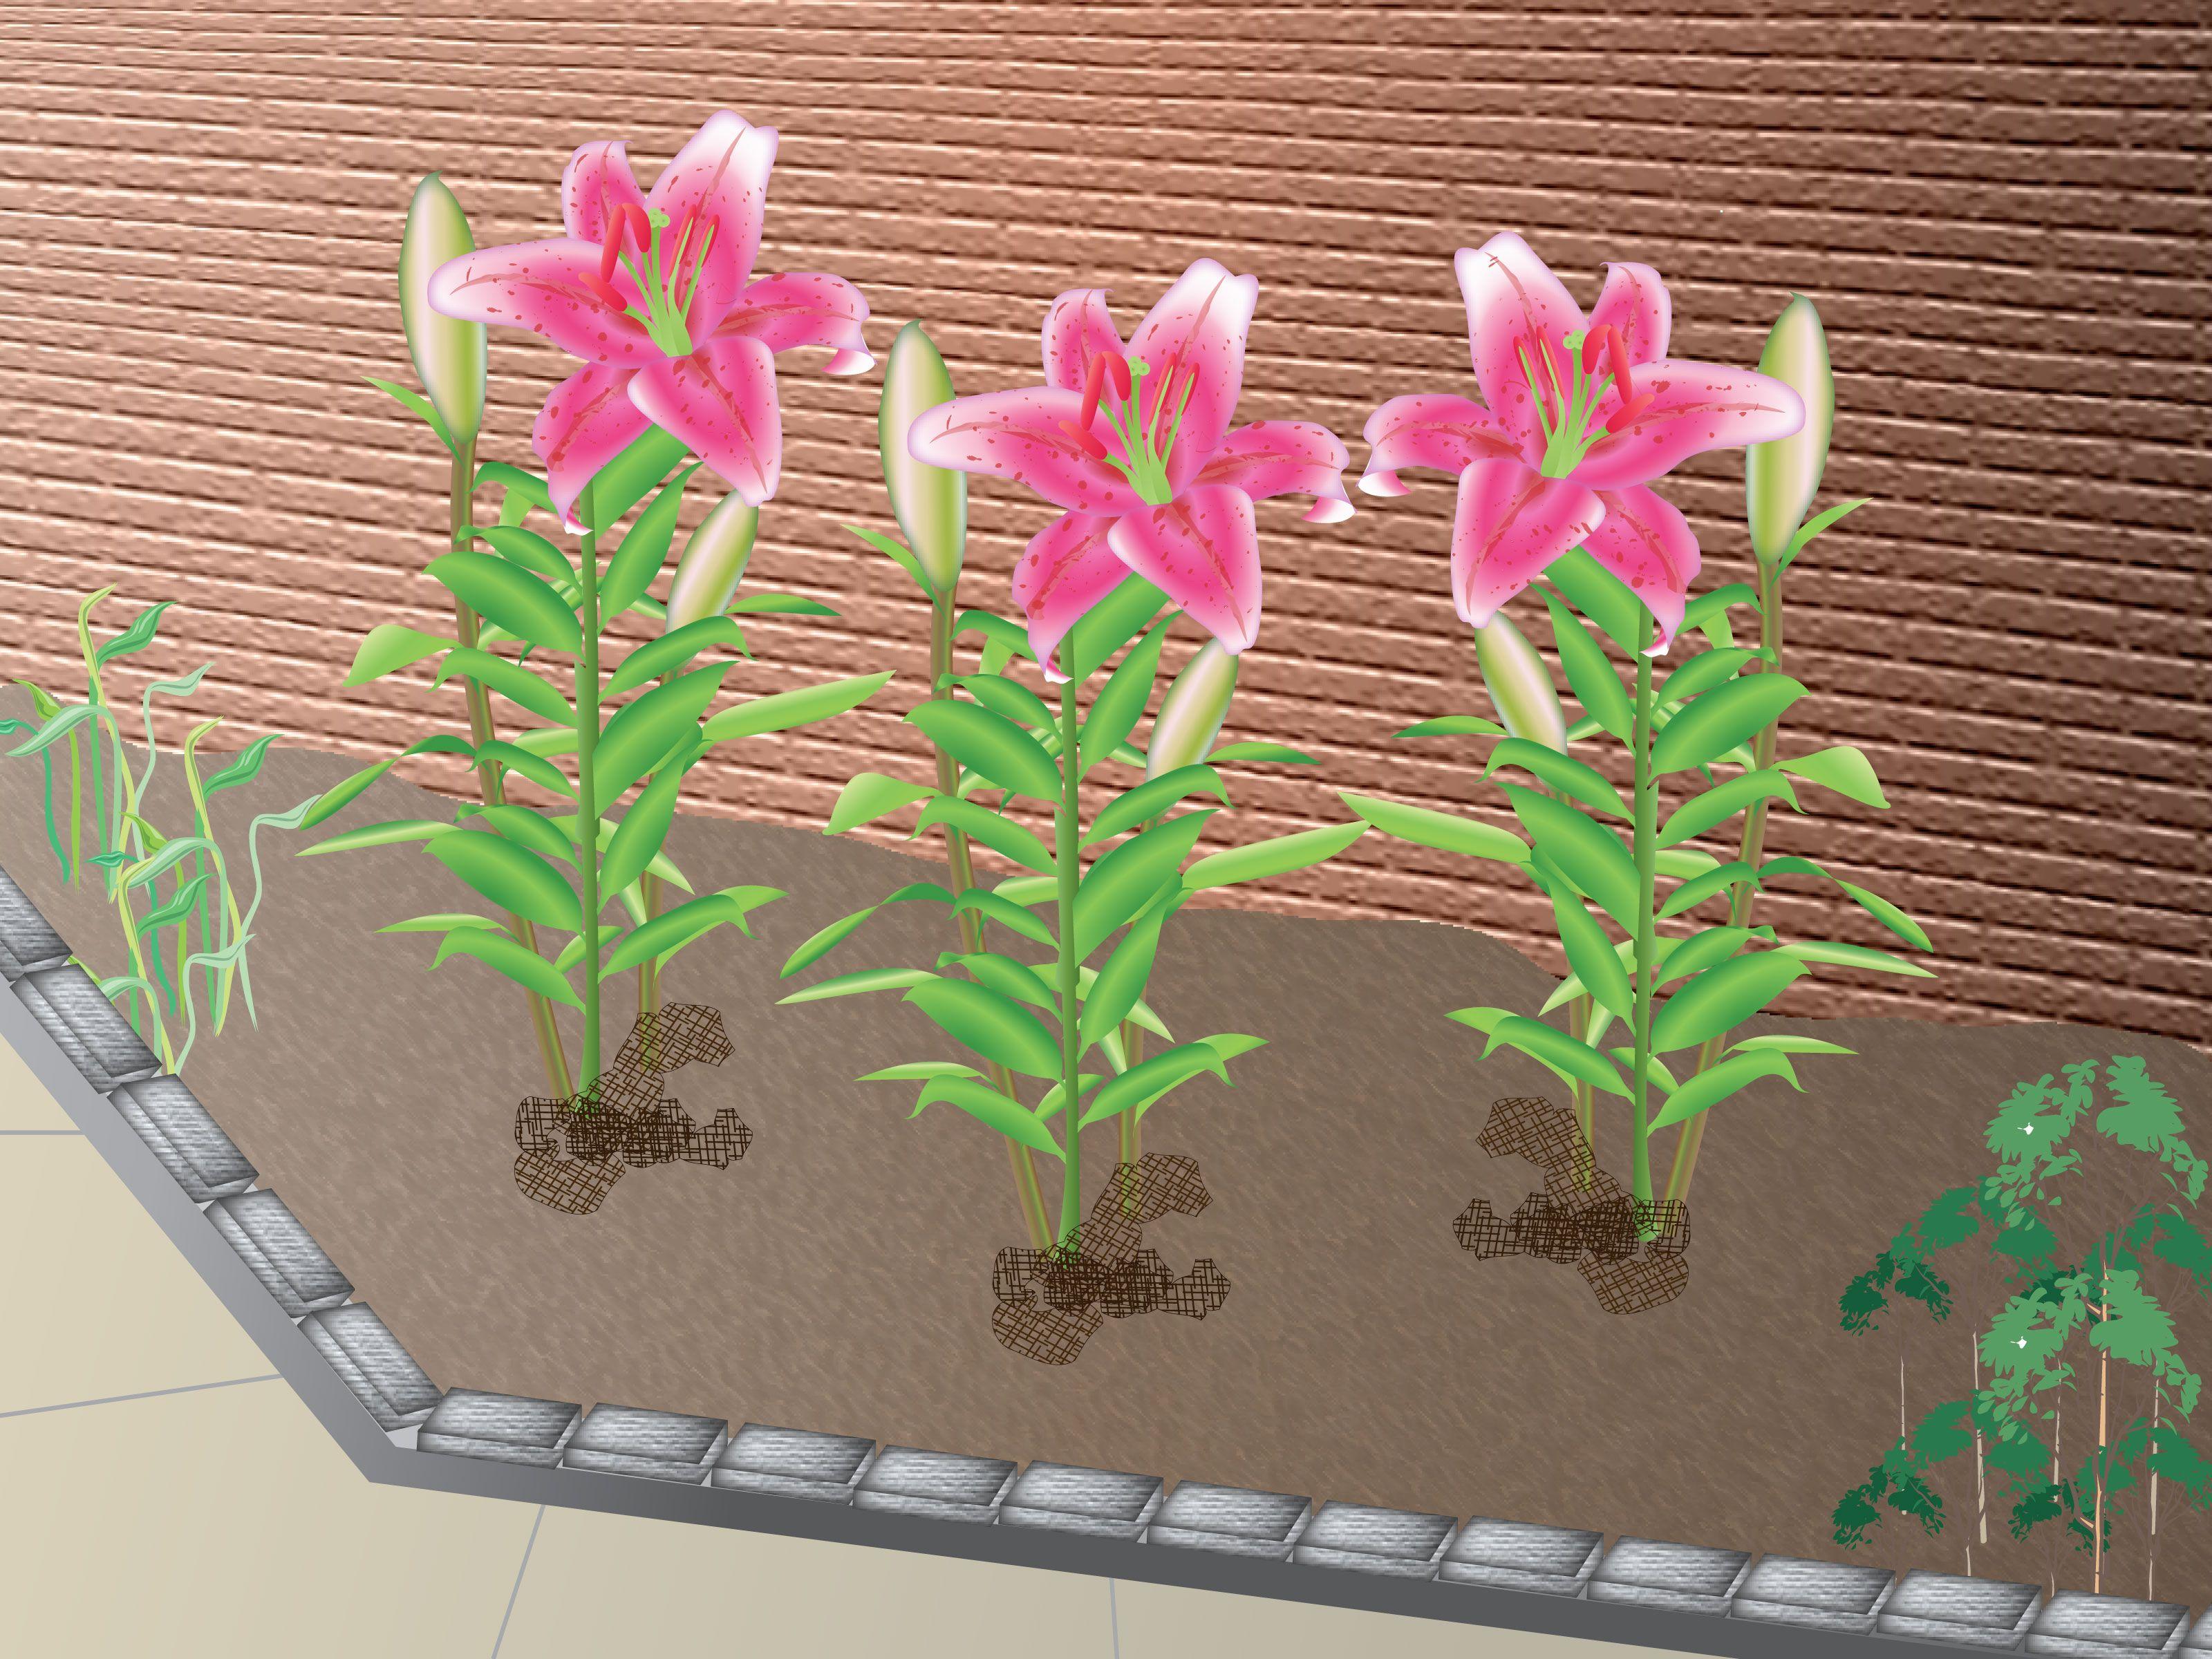 Grow stargazer lilies garden pinterest stargazer gardens and how to grow stargazer lilies via wikihow izmirmasajfo